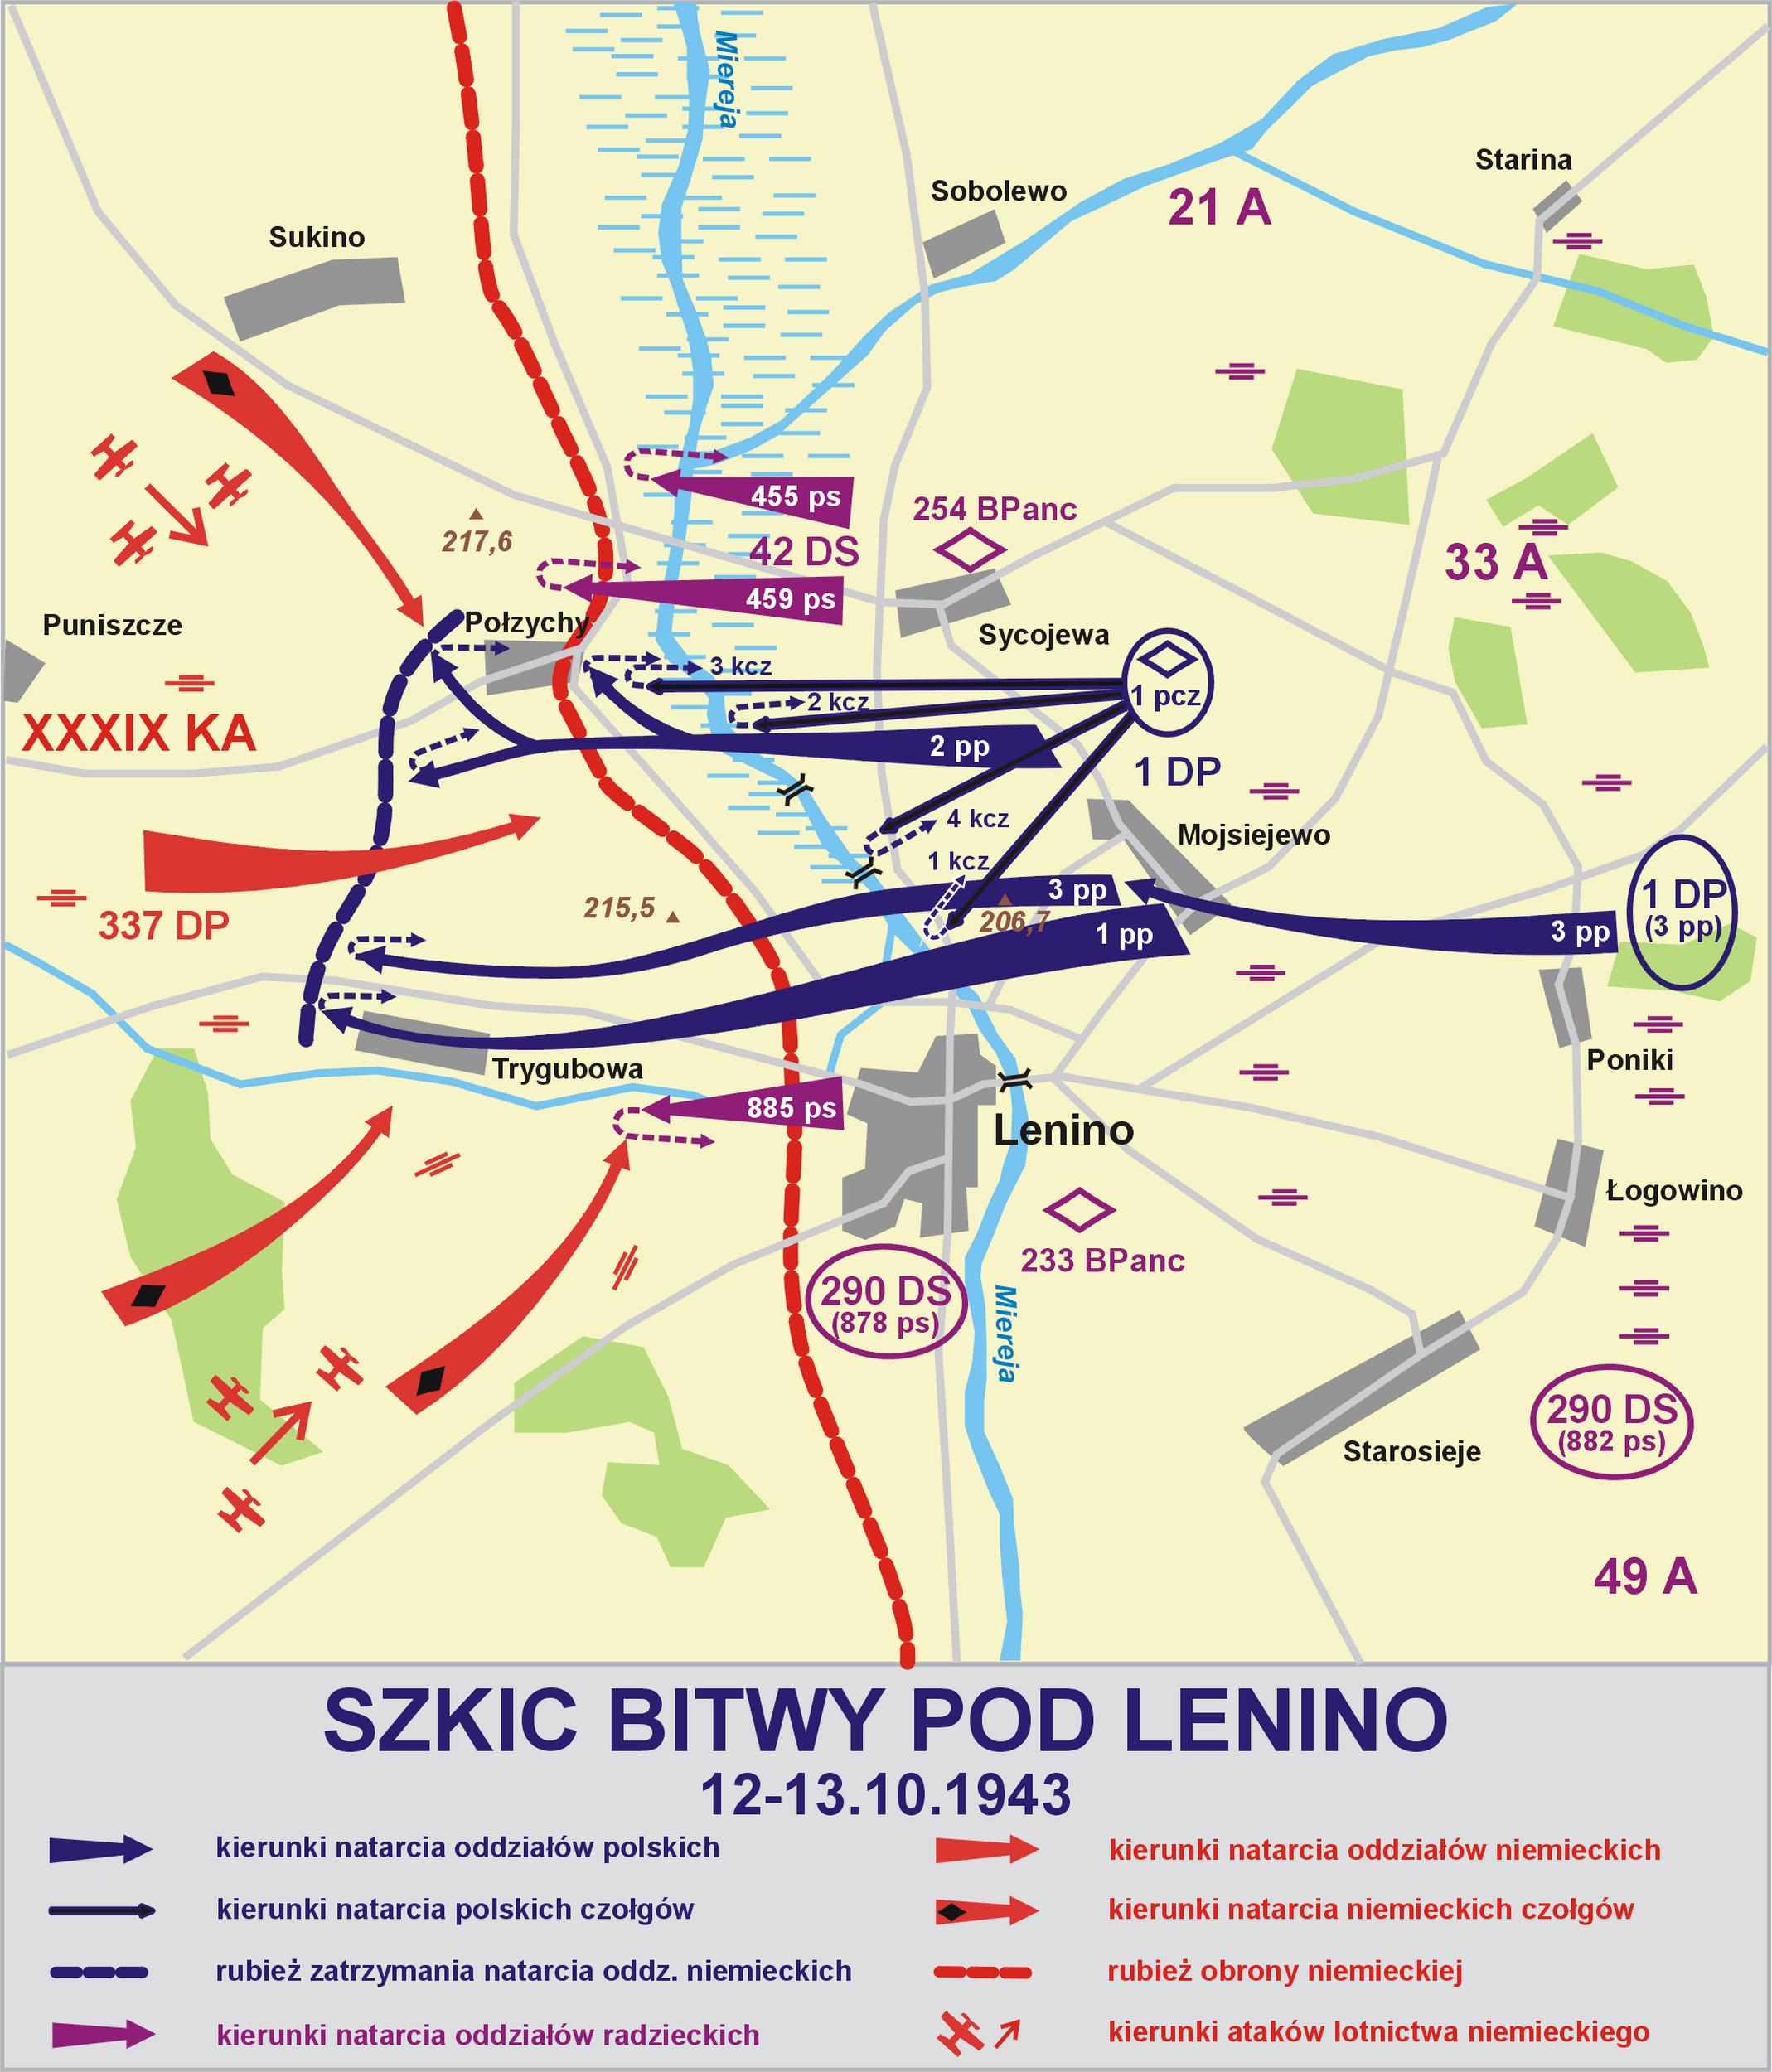 Bitwa pod Lenino – Wikipedia, wolna encyklopedia